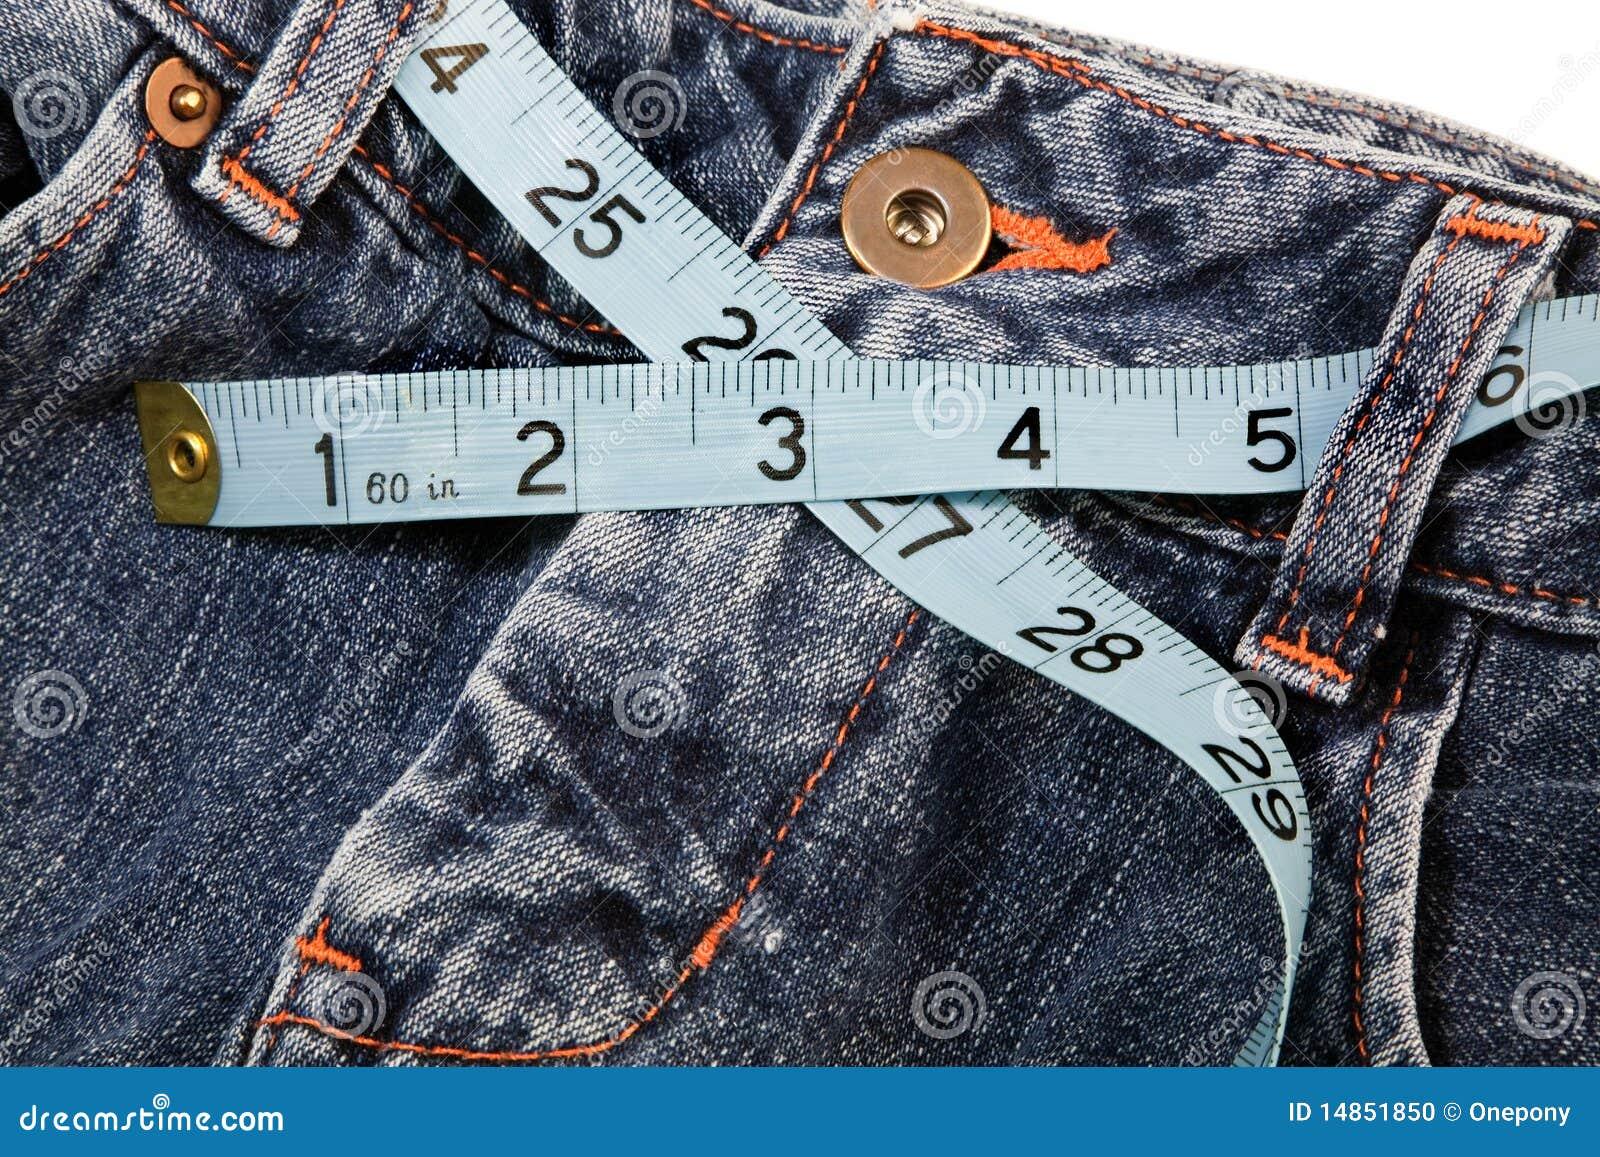 Measuring Blue Jeans